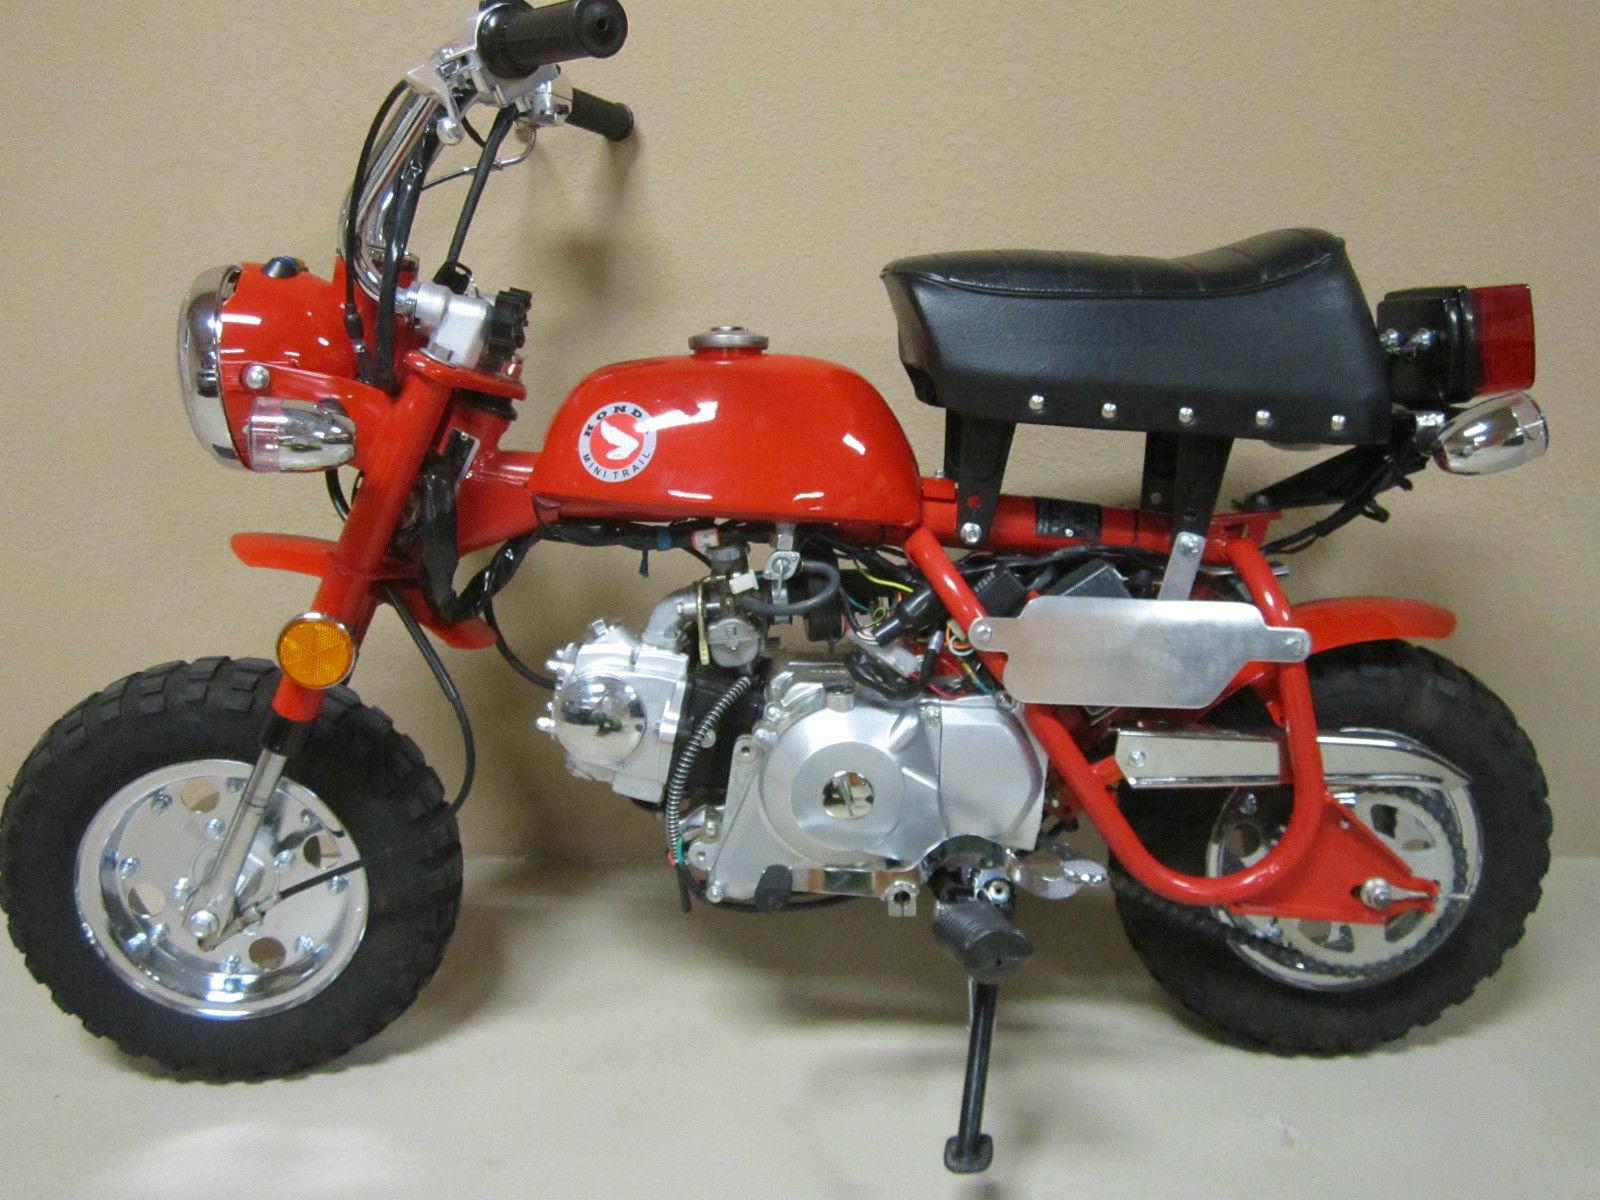 4 Speed Honda Mini Trail 91 Miles Near New Bike Motorcycle 1970 Vin Decoder Ct70 Z50 Monkey